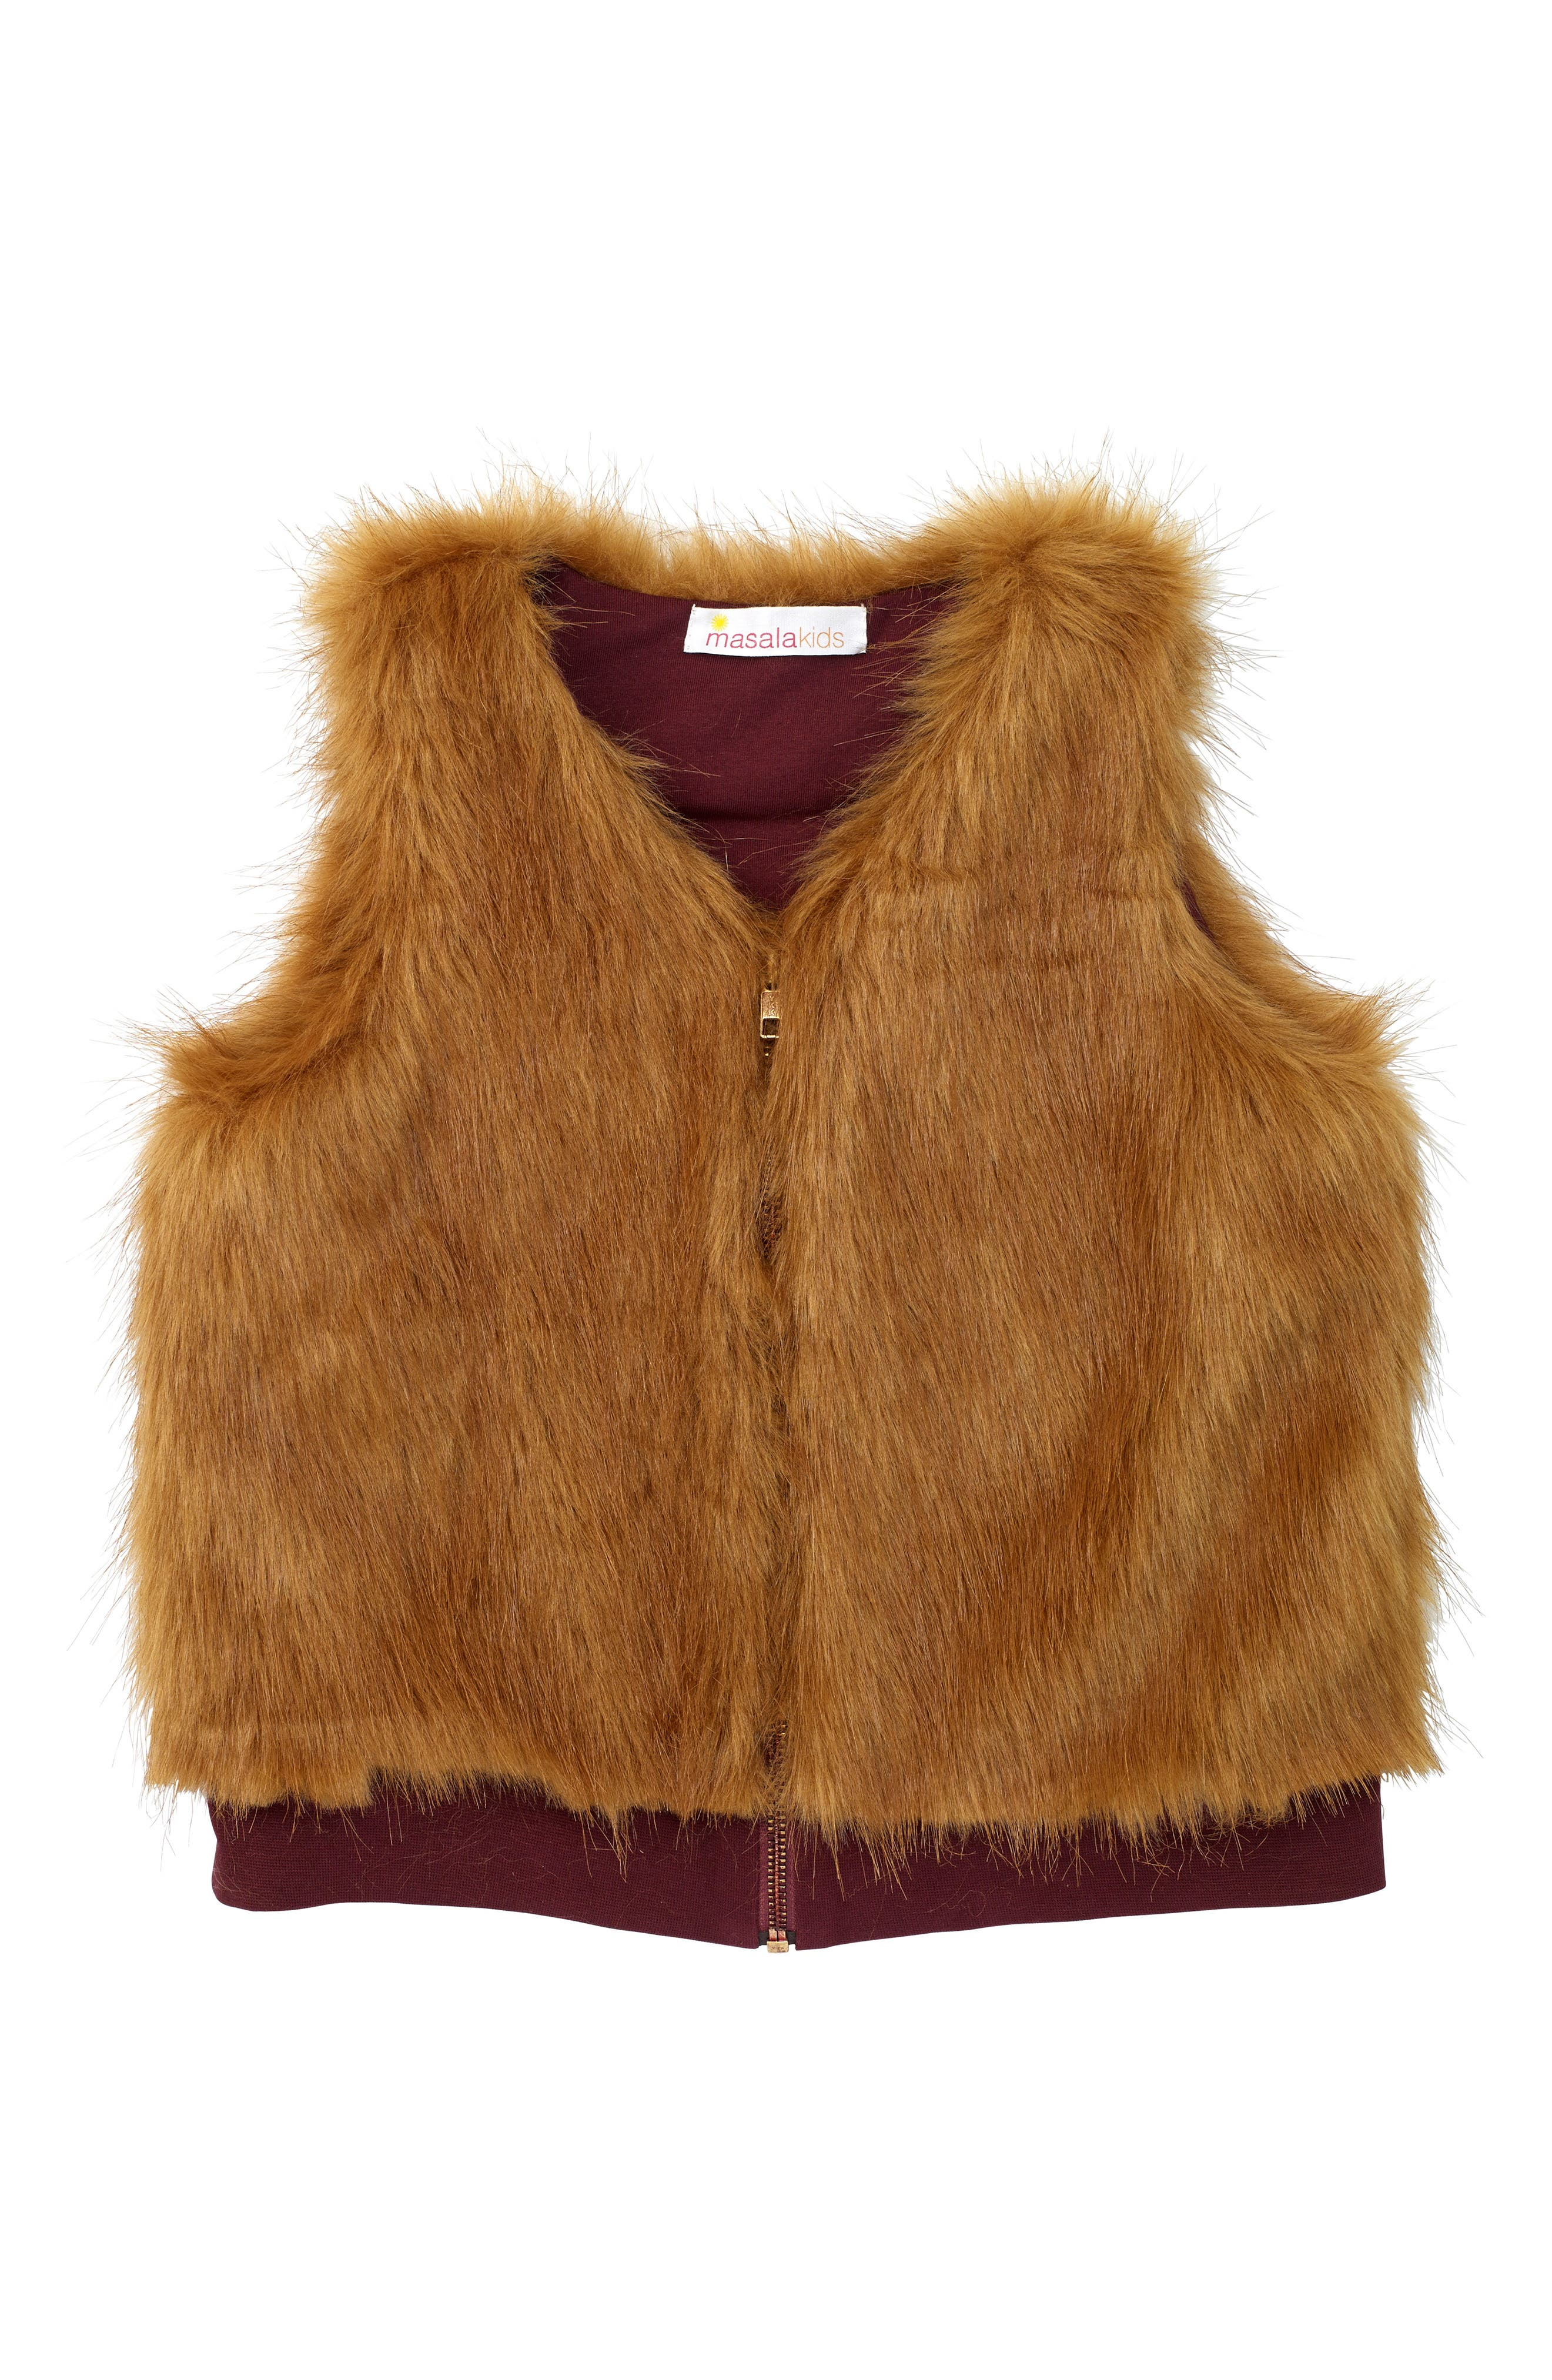 Alternate Image 1 Selected - Masala Baby Faux Fur Vest (Baby Girls, Toddler Girls, Little Girls & Big Girls)